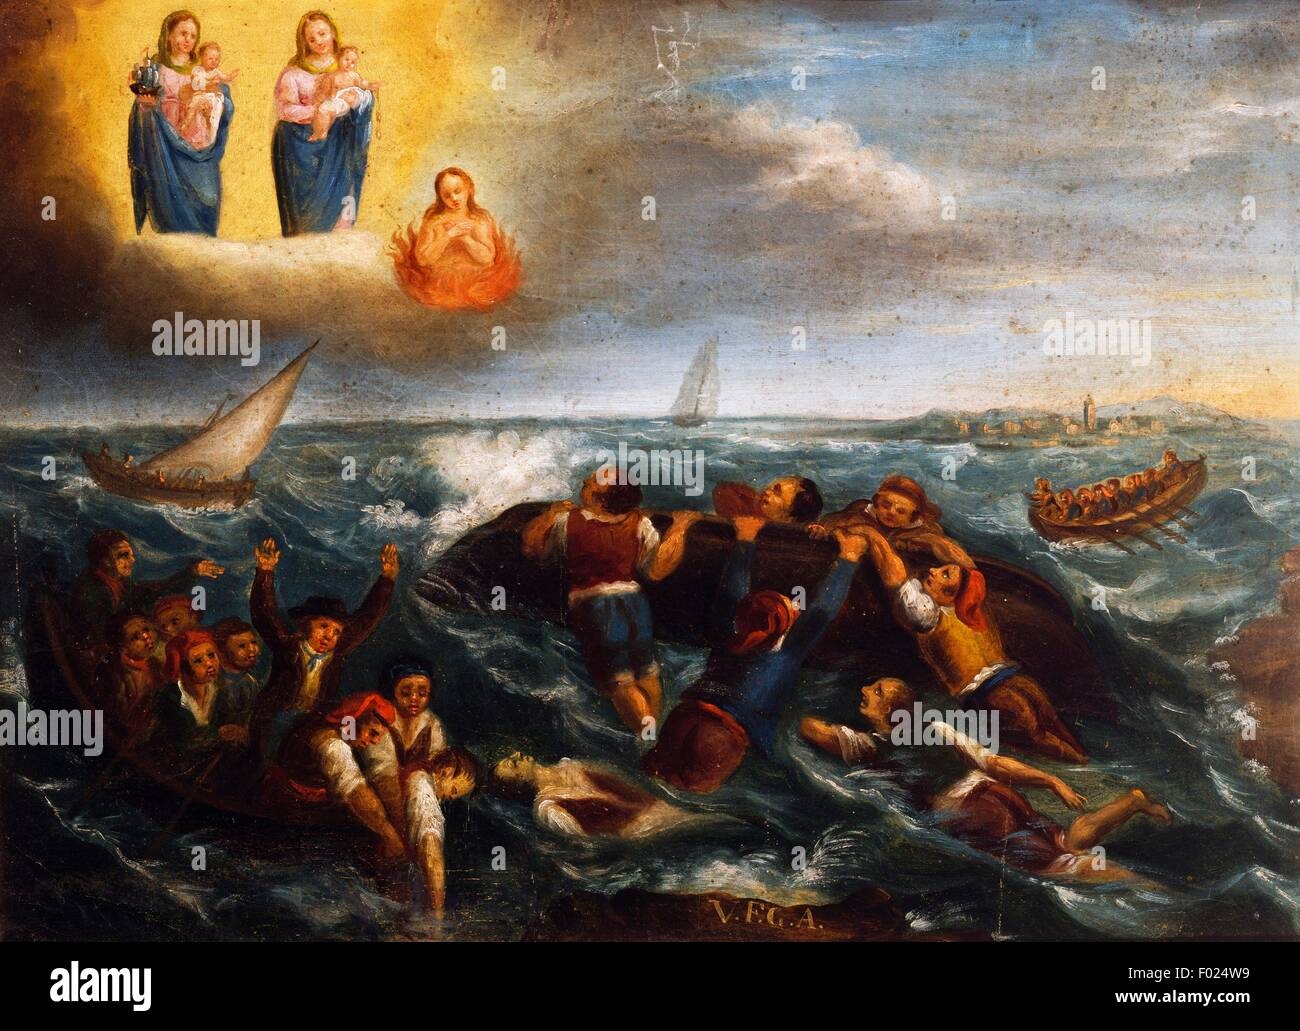 Shipwreck, seafaring ex voto, Italy, 19th century. - Stock Image